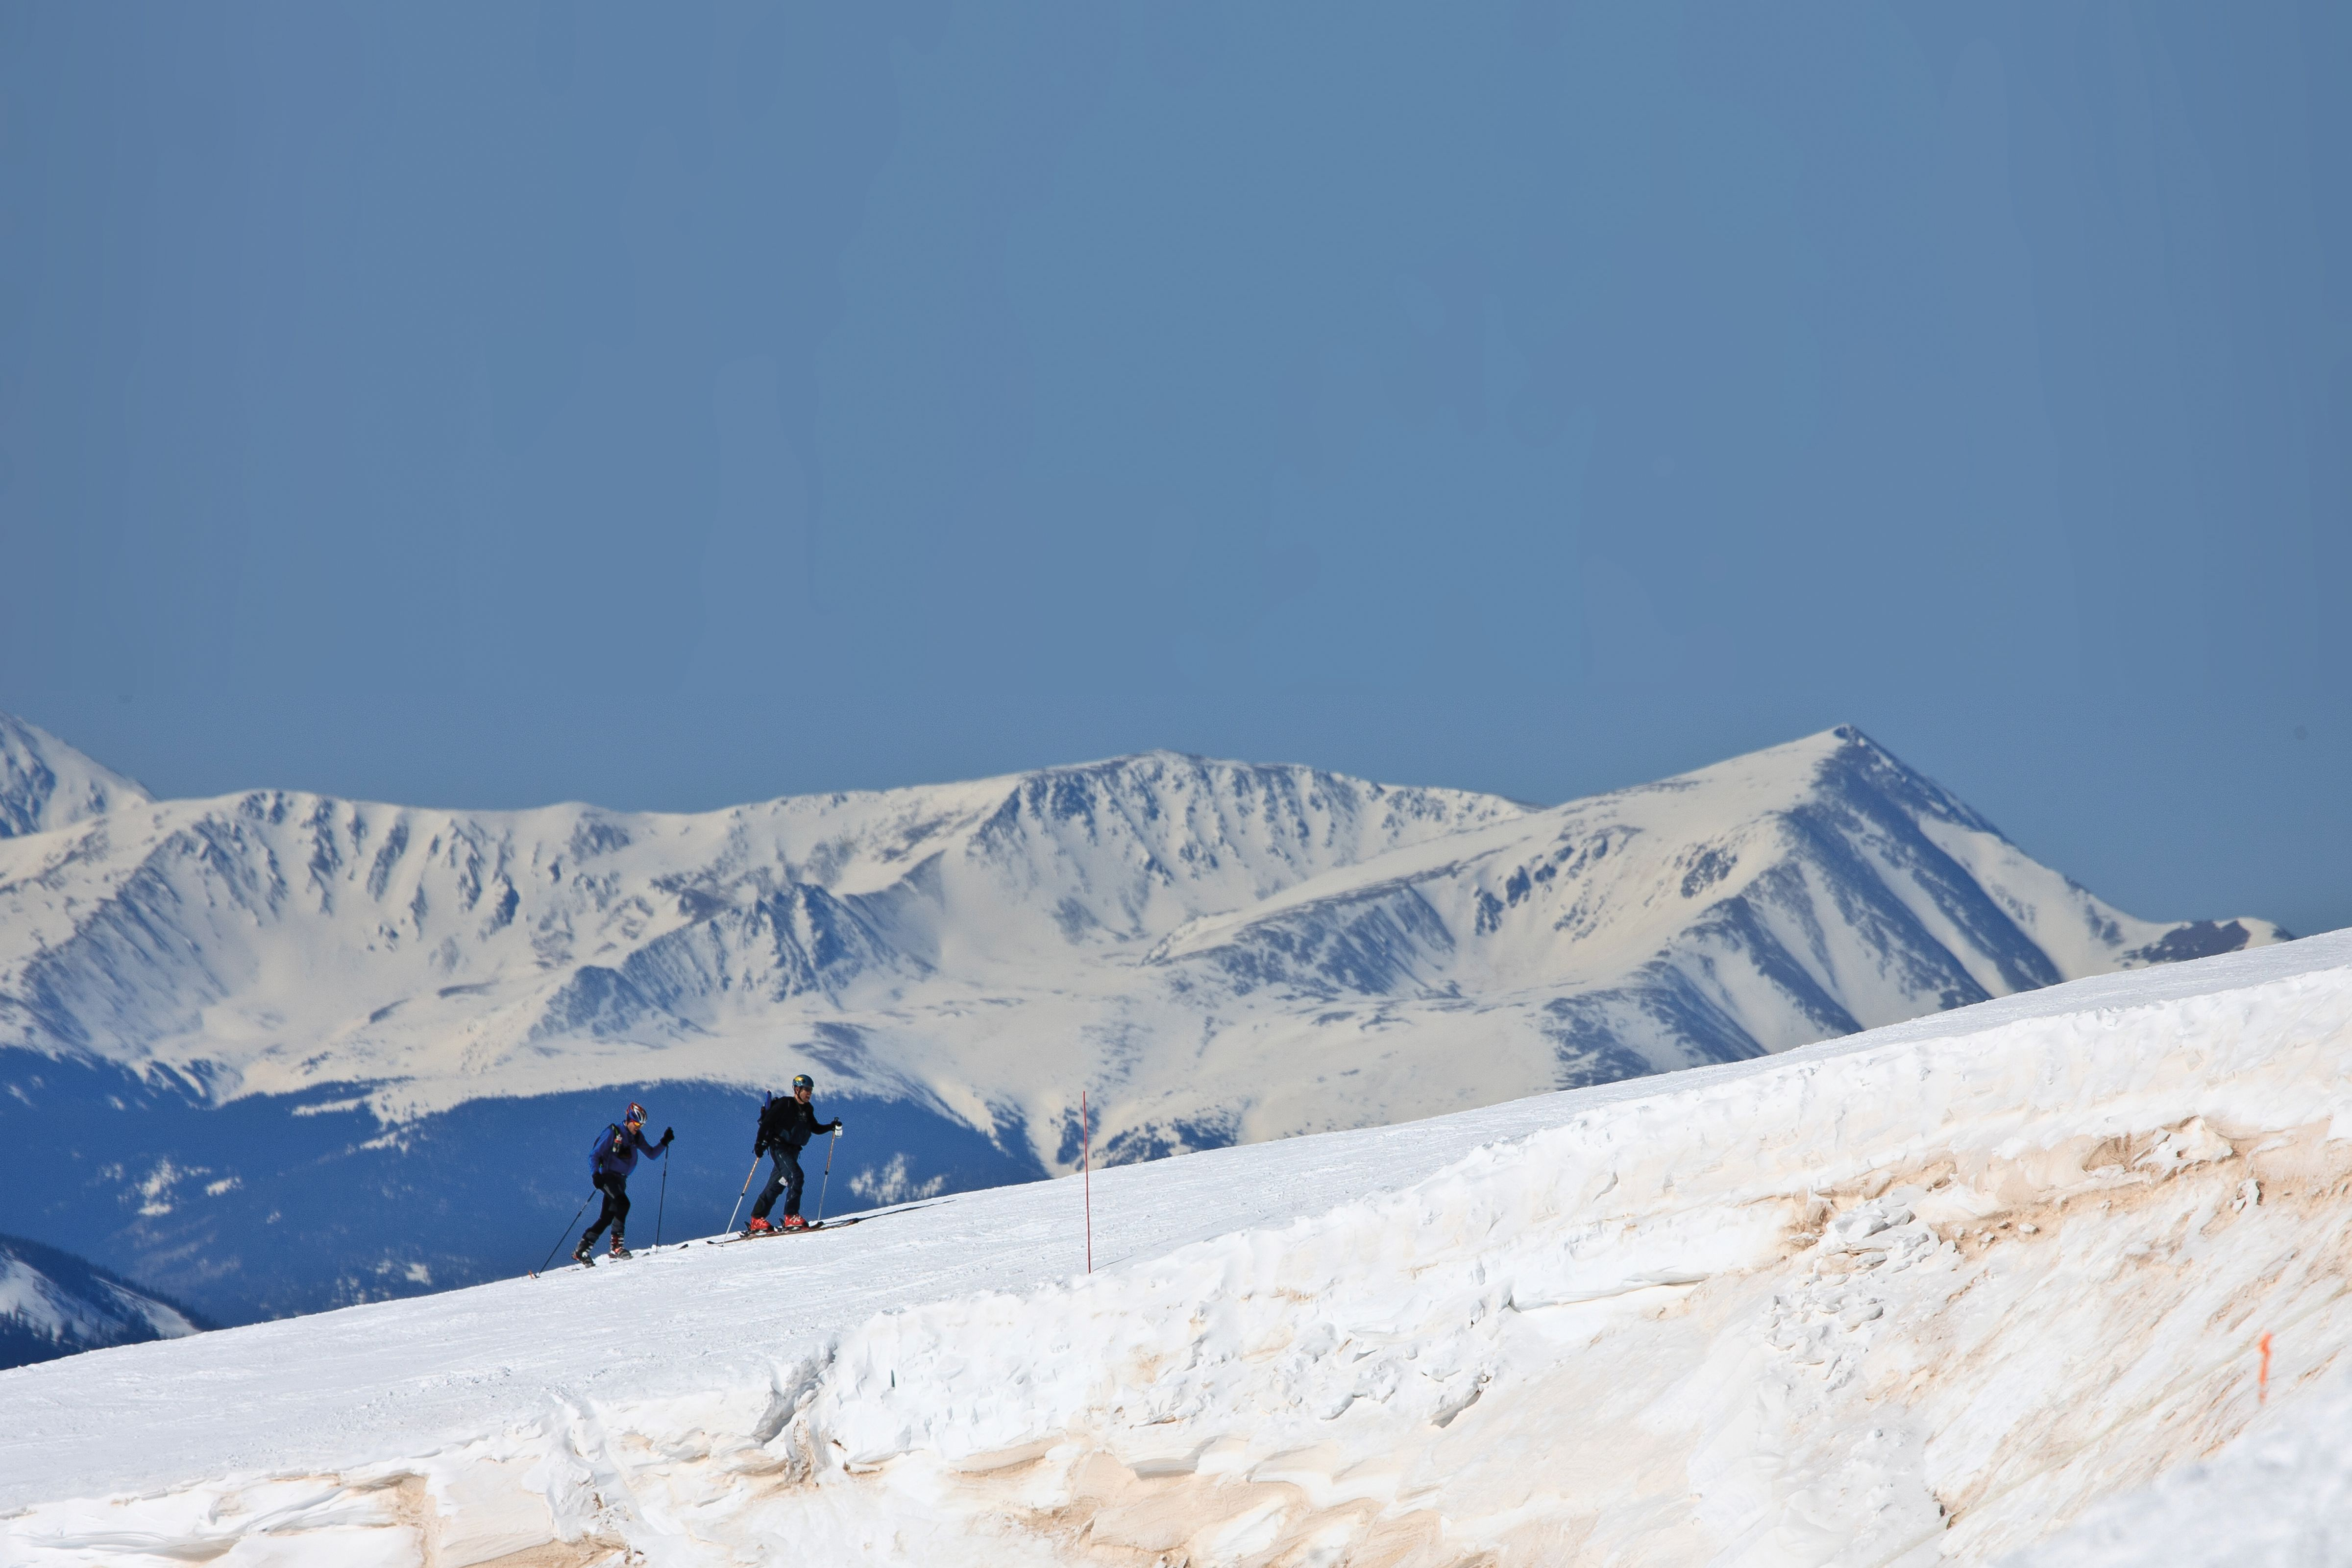 Cosu winter 2012 pete swenson featured hdzyzi